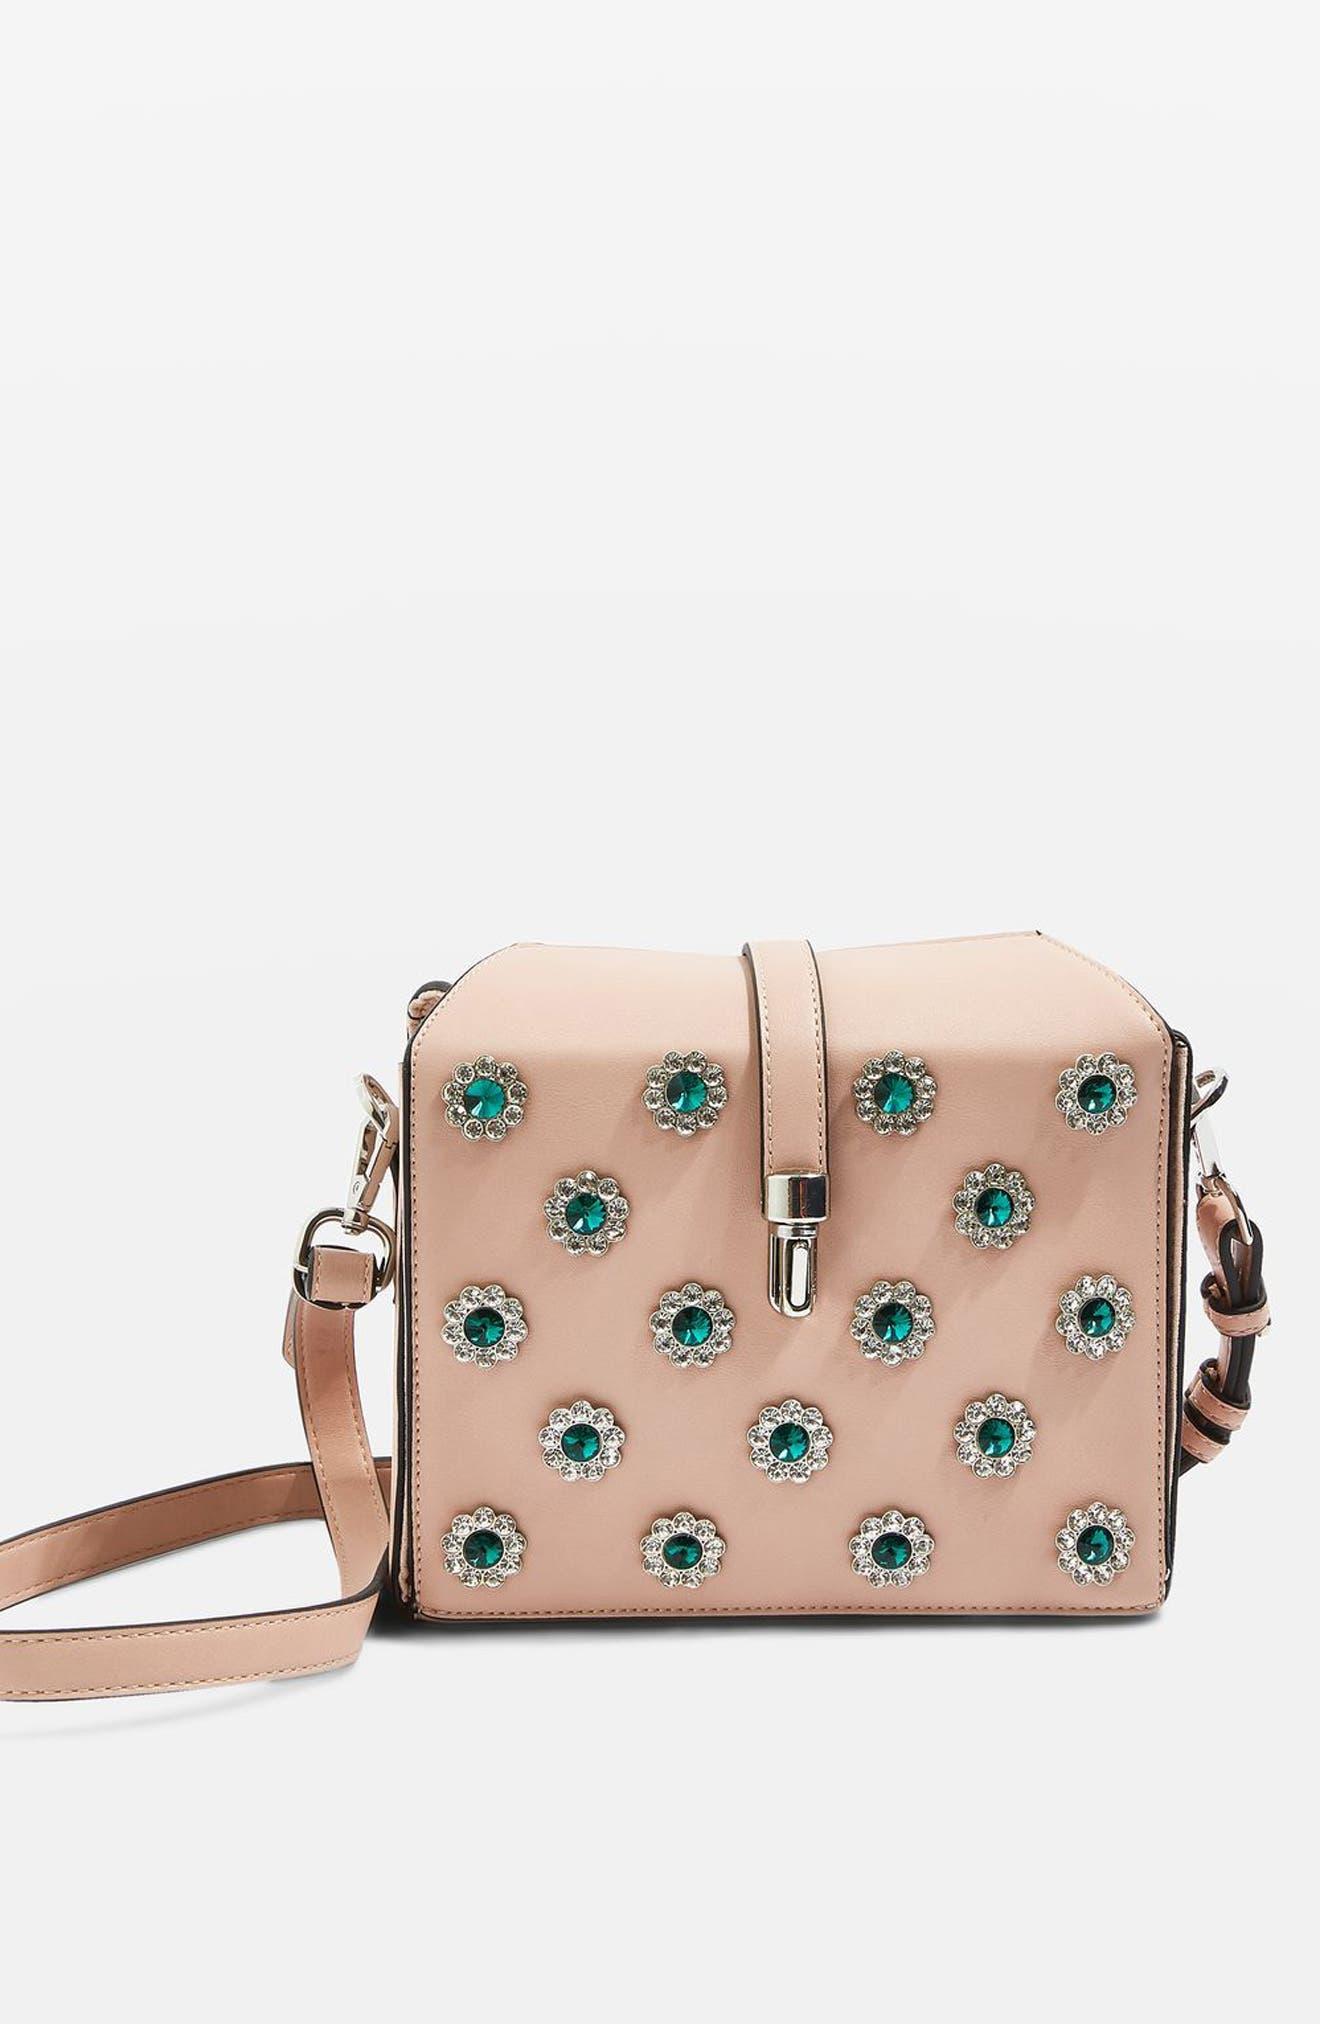 Topshop Bertie Embellished Boxy Crossbody Bag